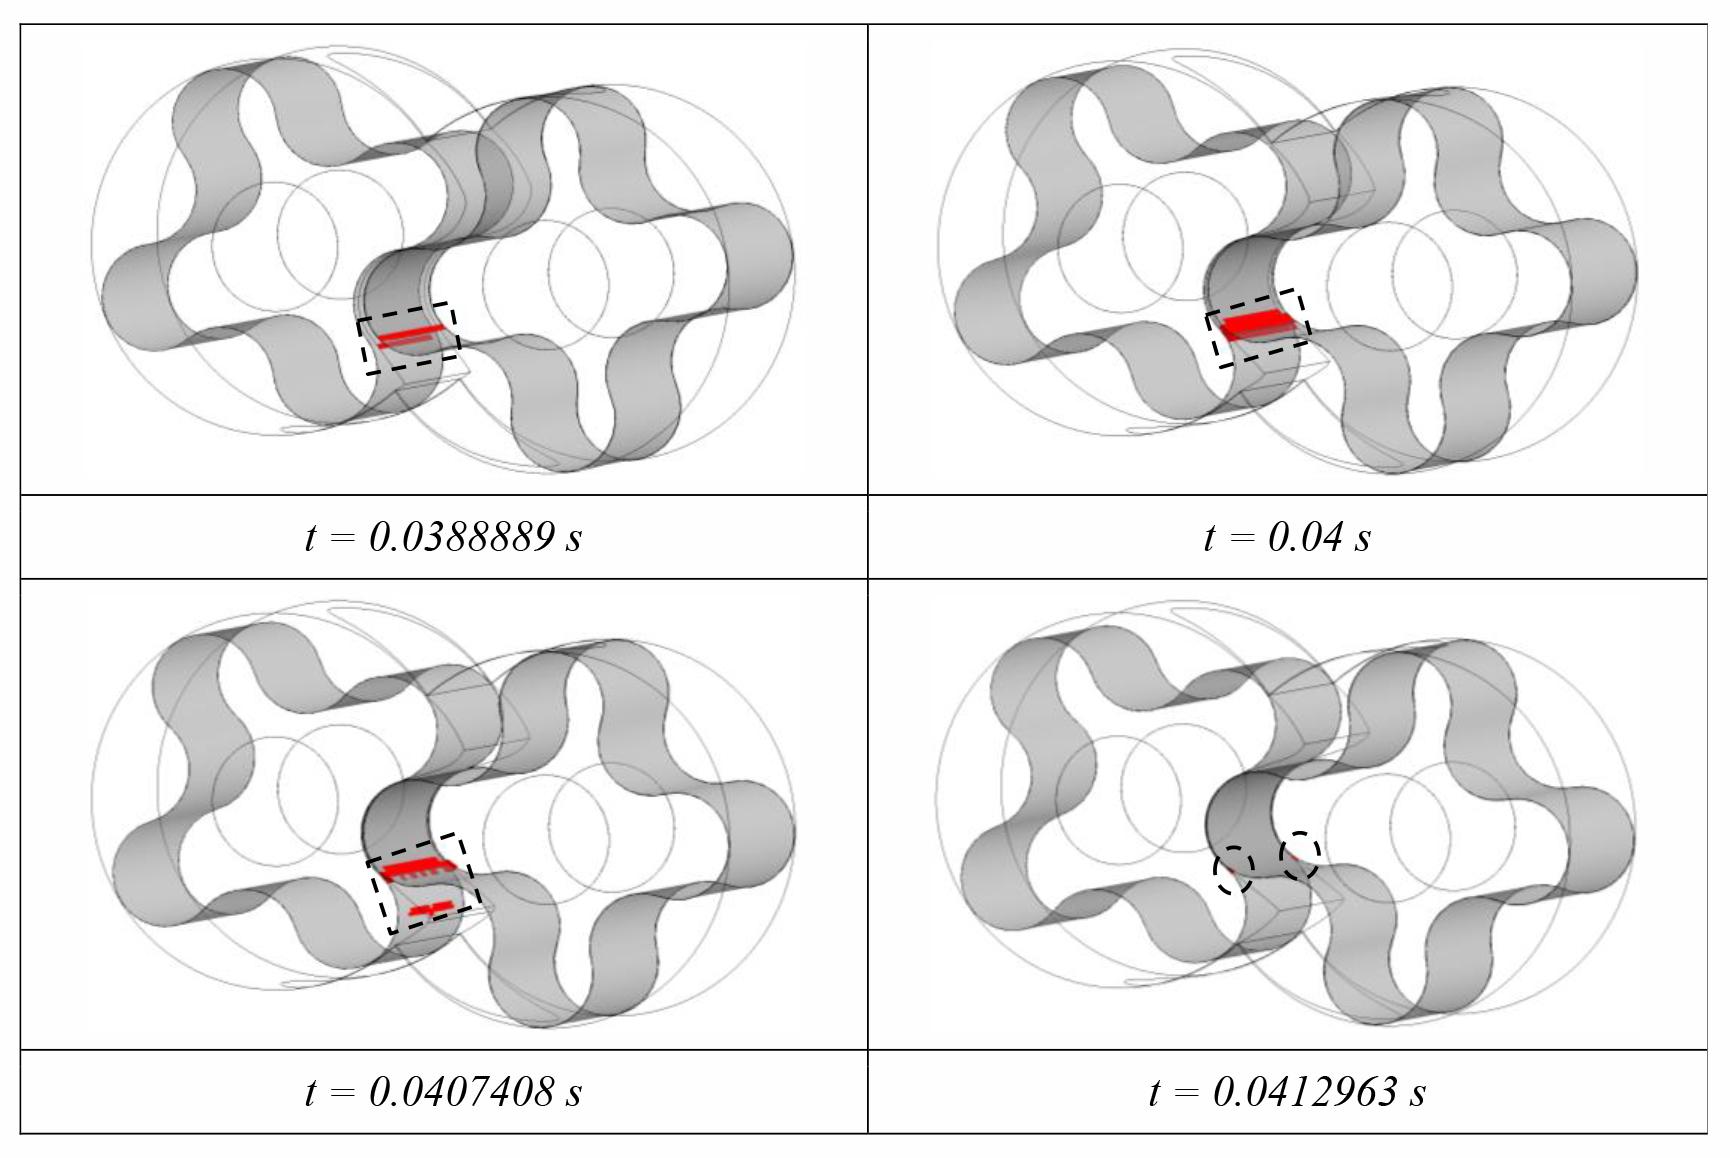 Occurance of cavitation regions